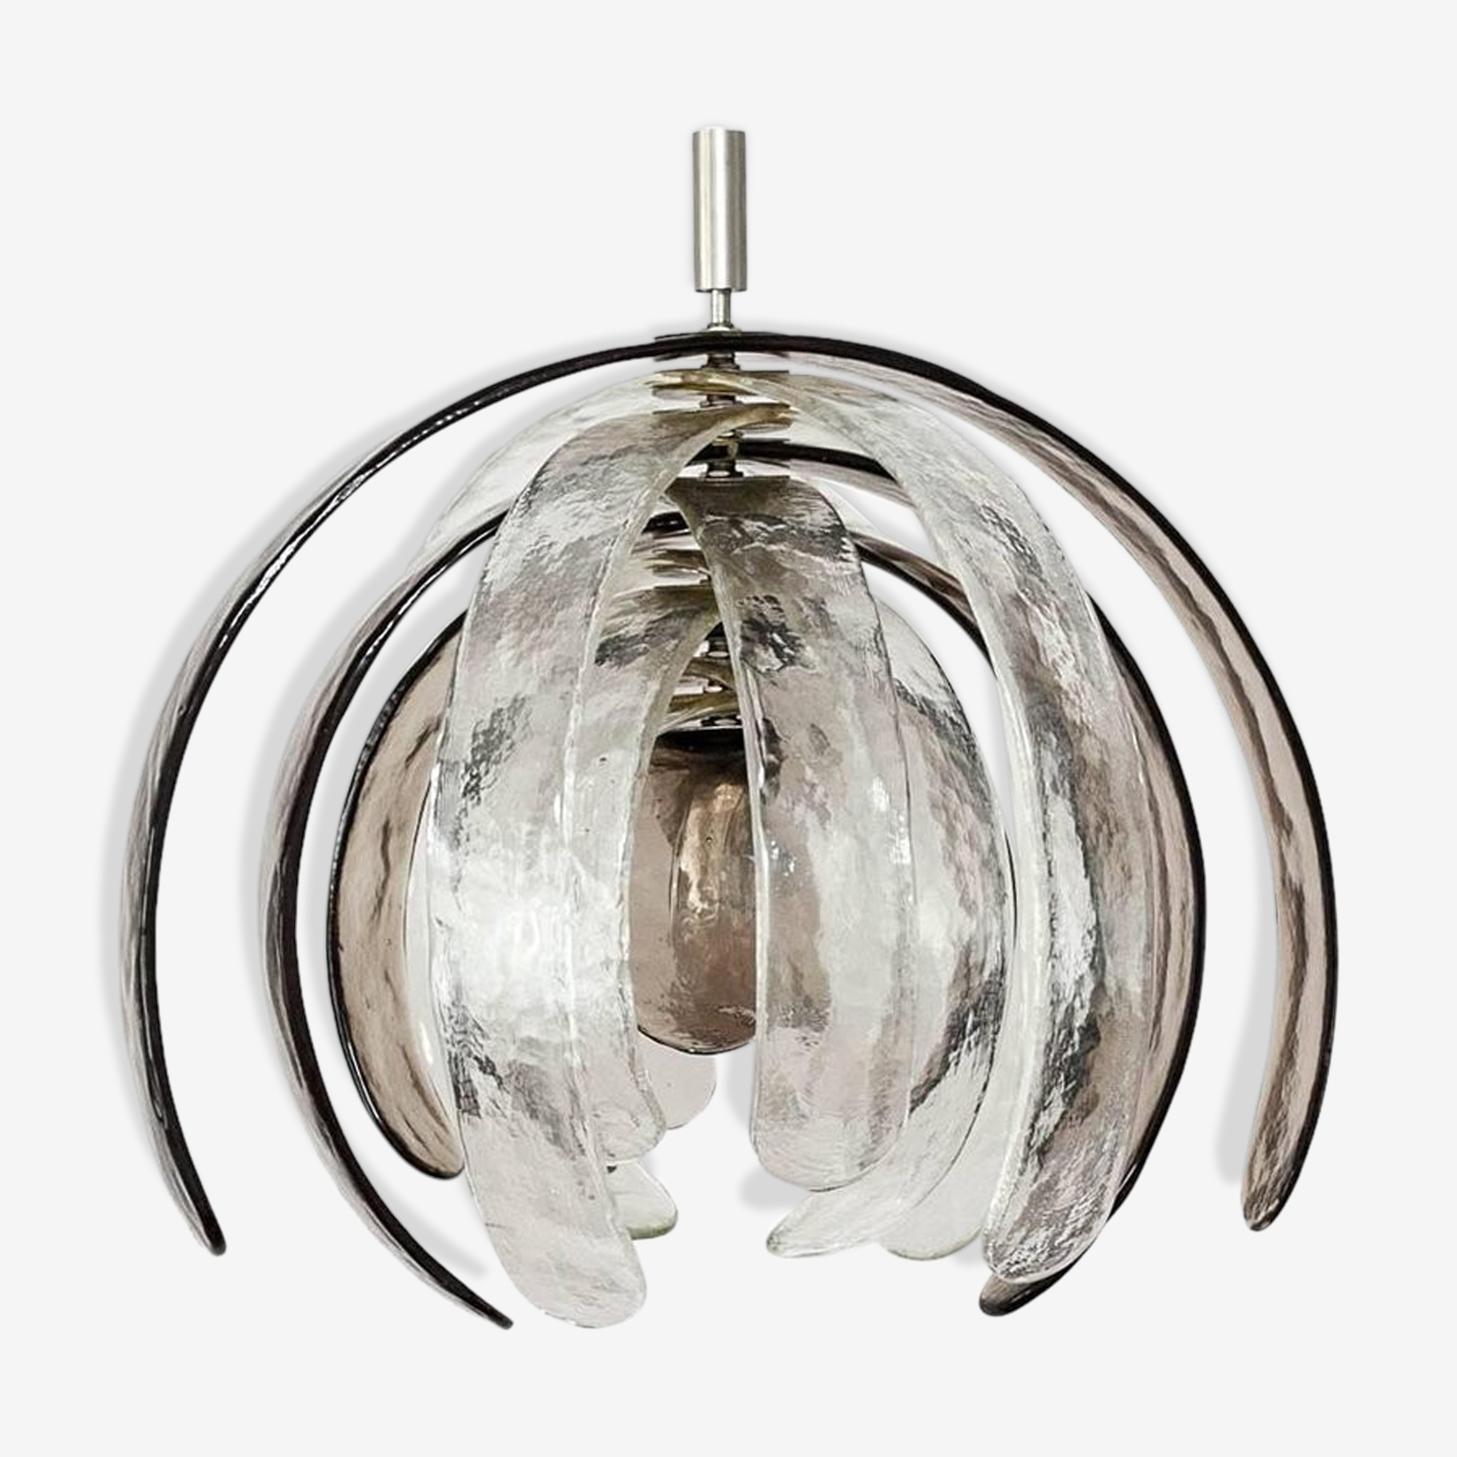 Lustre en verre de Murano 'Artichoke' Mazzega